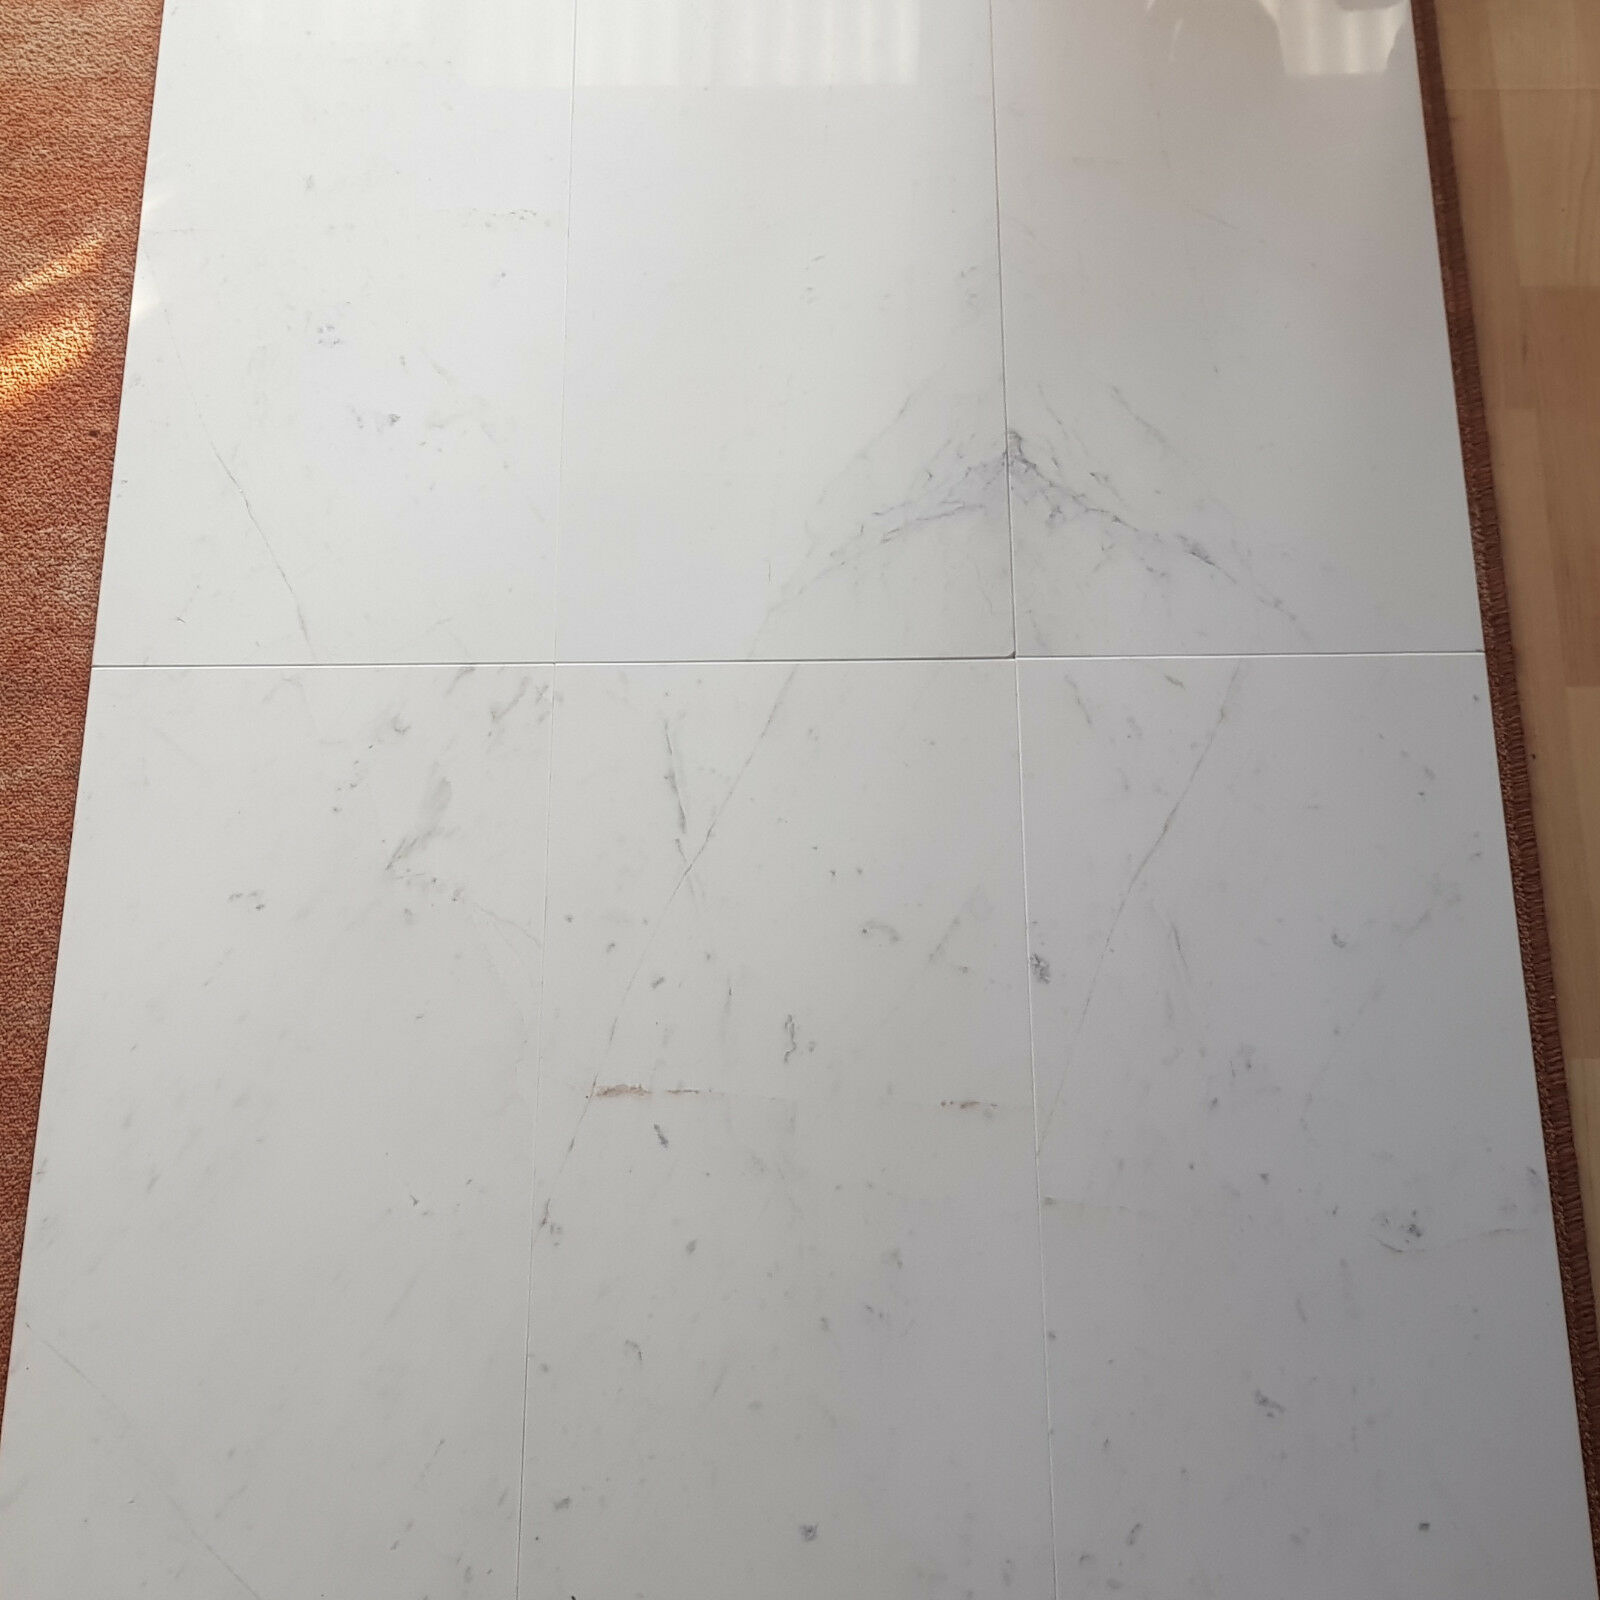 Marmor 30,5 x 61 x 1 cm - Griechenland 1.Wahl , Volakas, Estremoz, Weiss